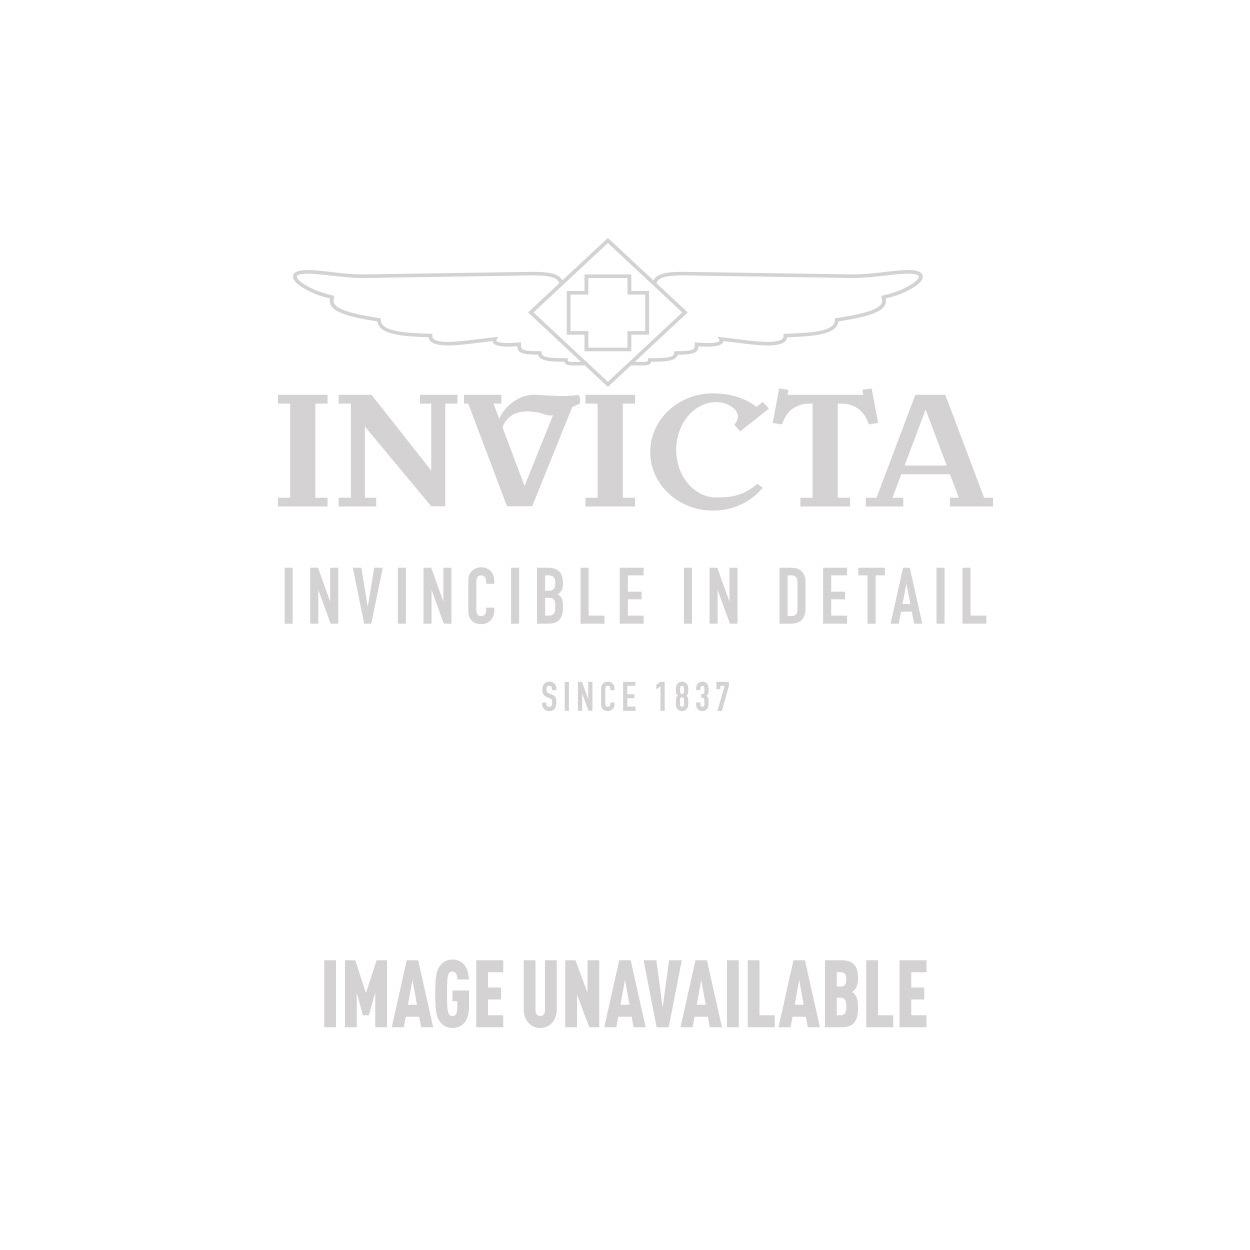 Invicta Sea Base Quartz Watch - Gold, Blue case with Black tone  Polyurethane band -